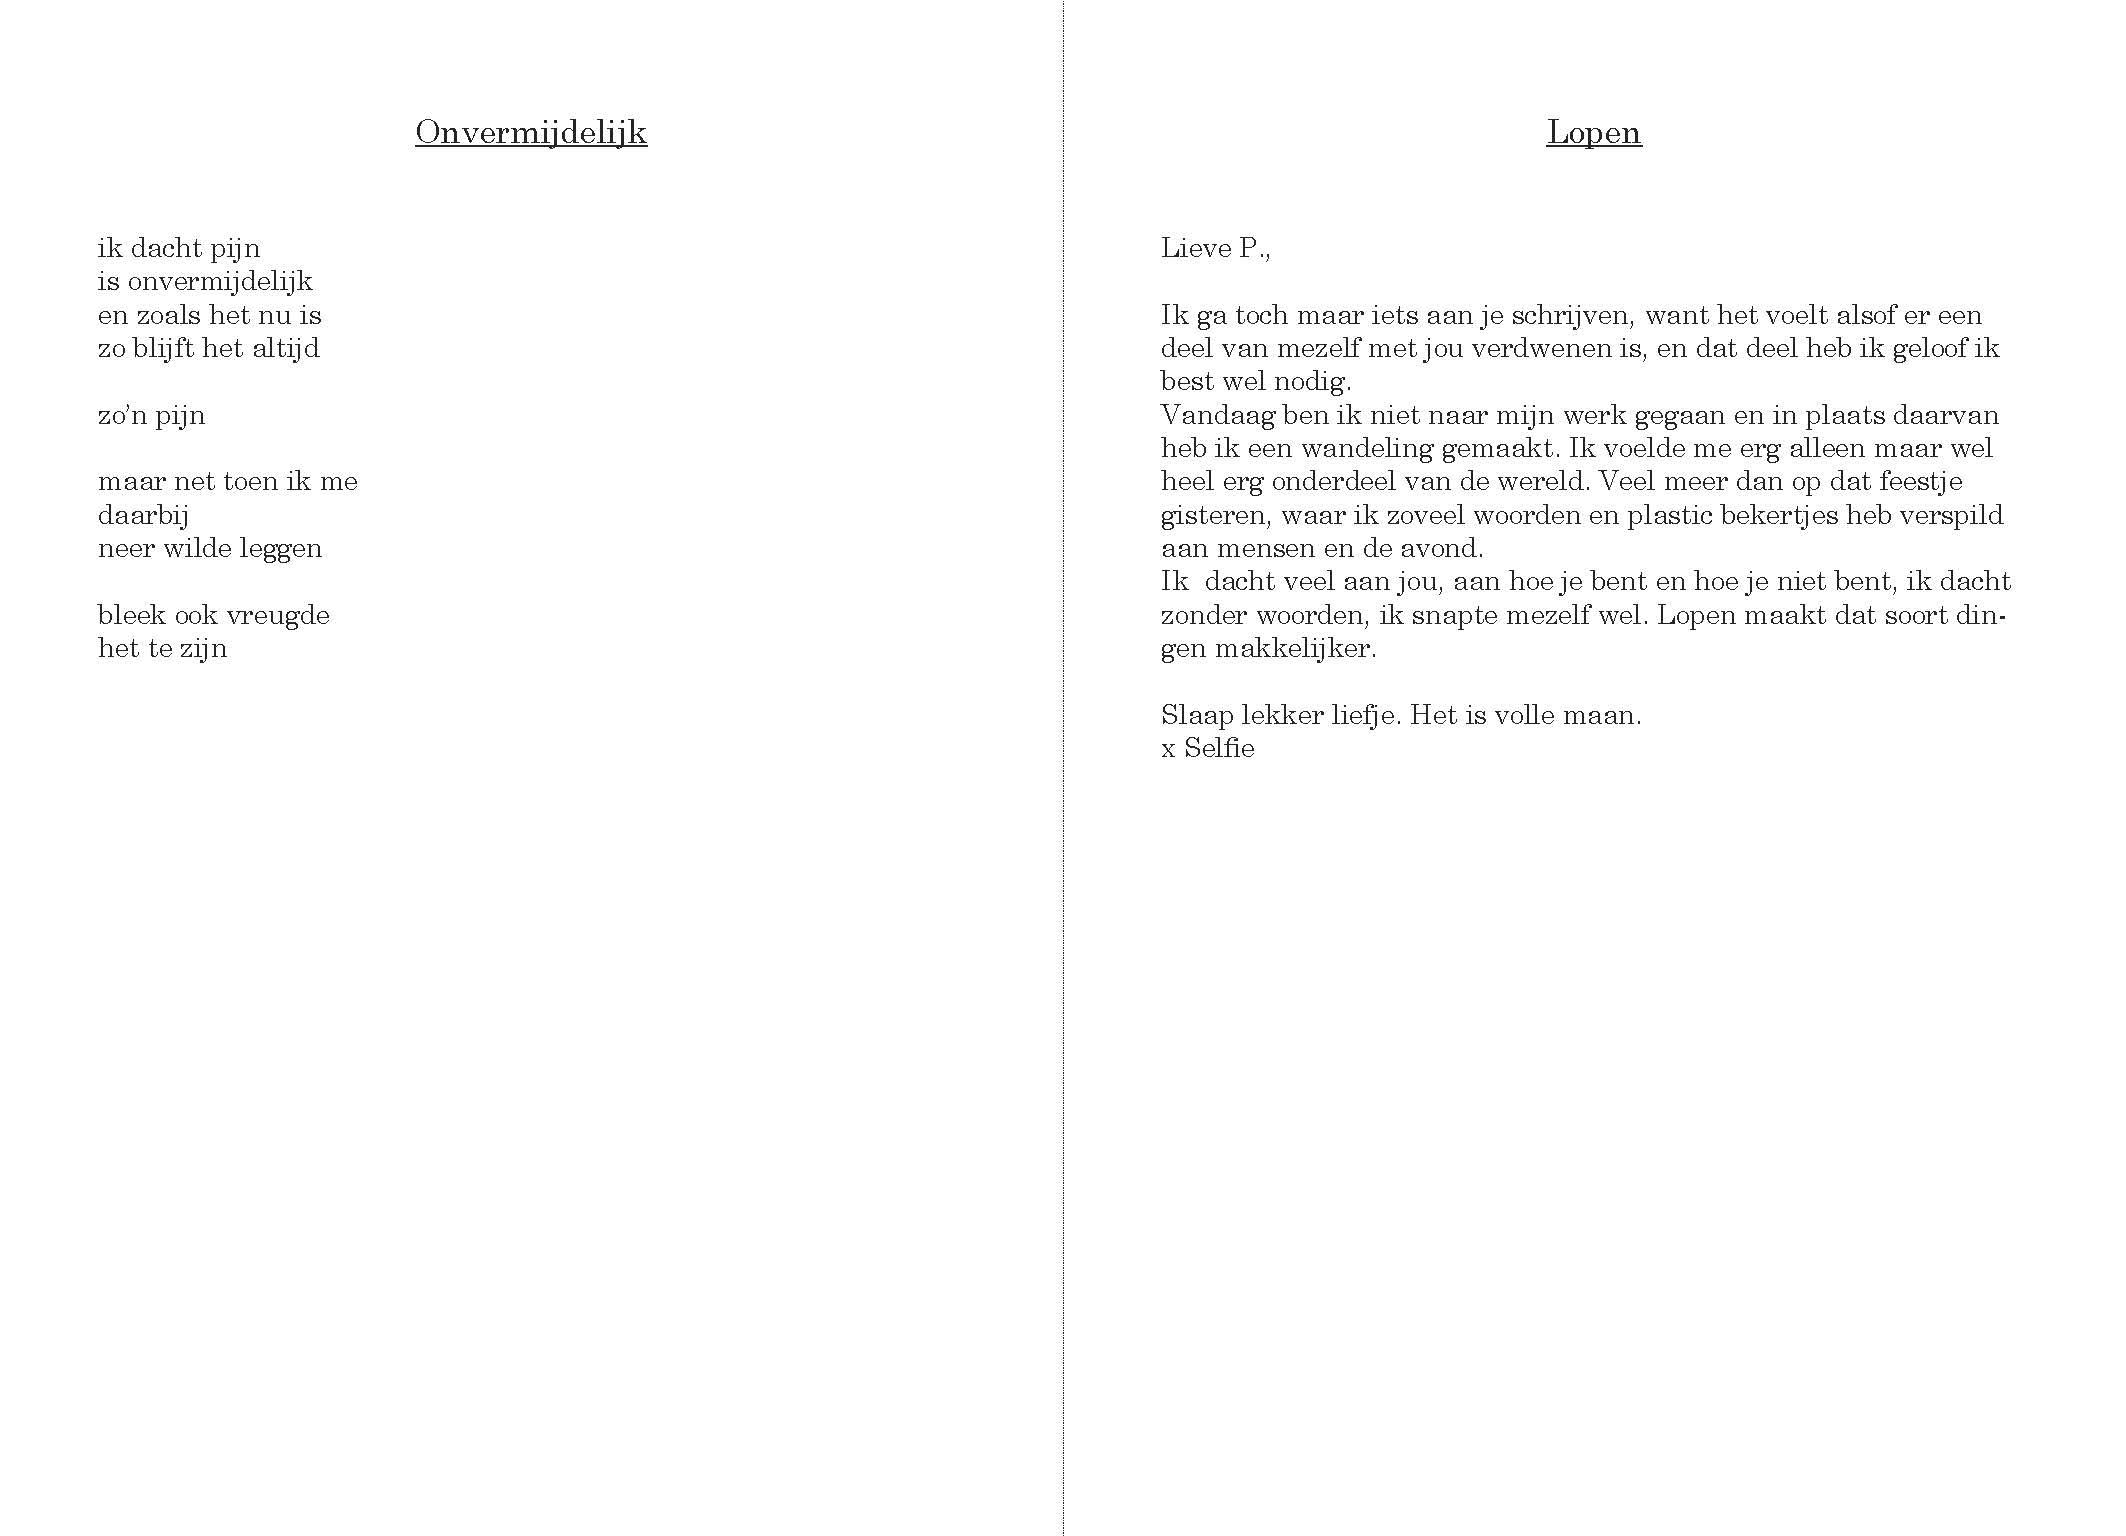 Manuscript-Selfie-YildauterBeek-Lang_Pagina_29.jpg